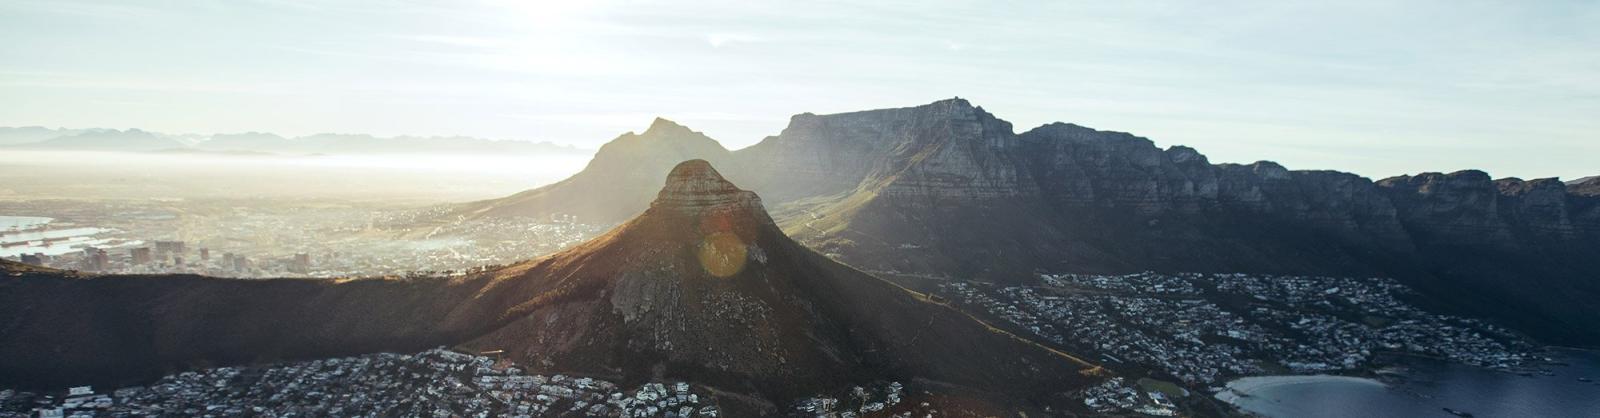 Carey Olsen in Cape Town